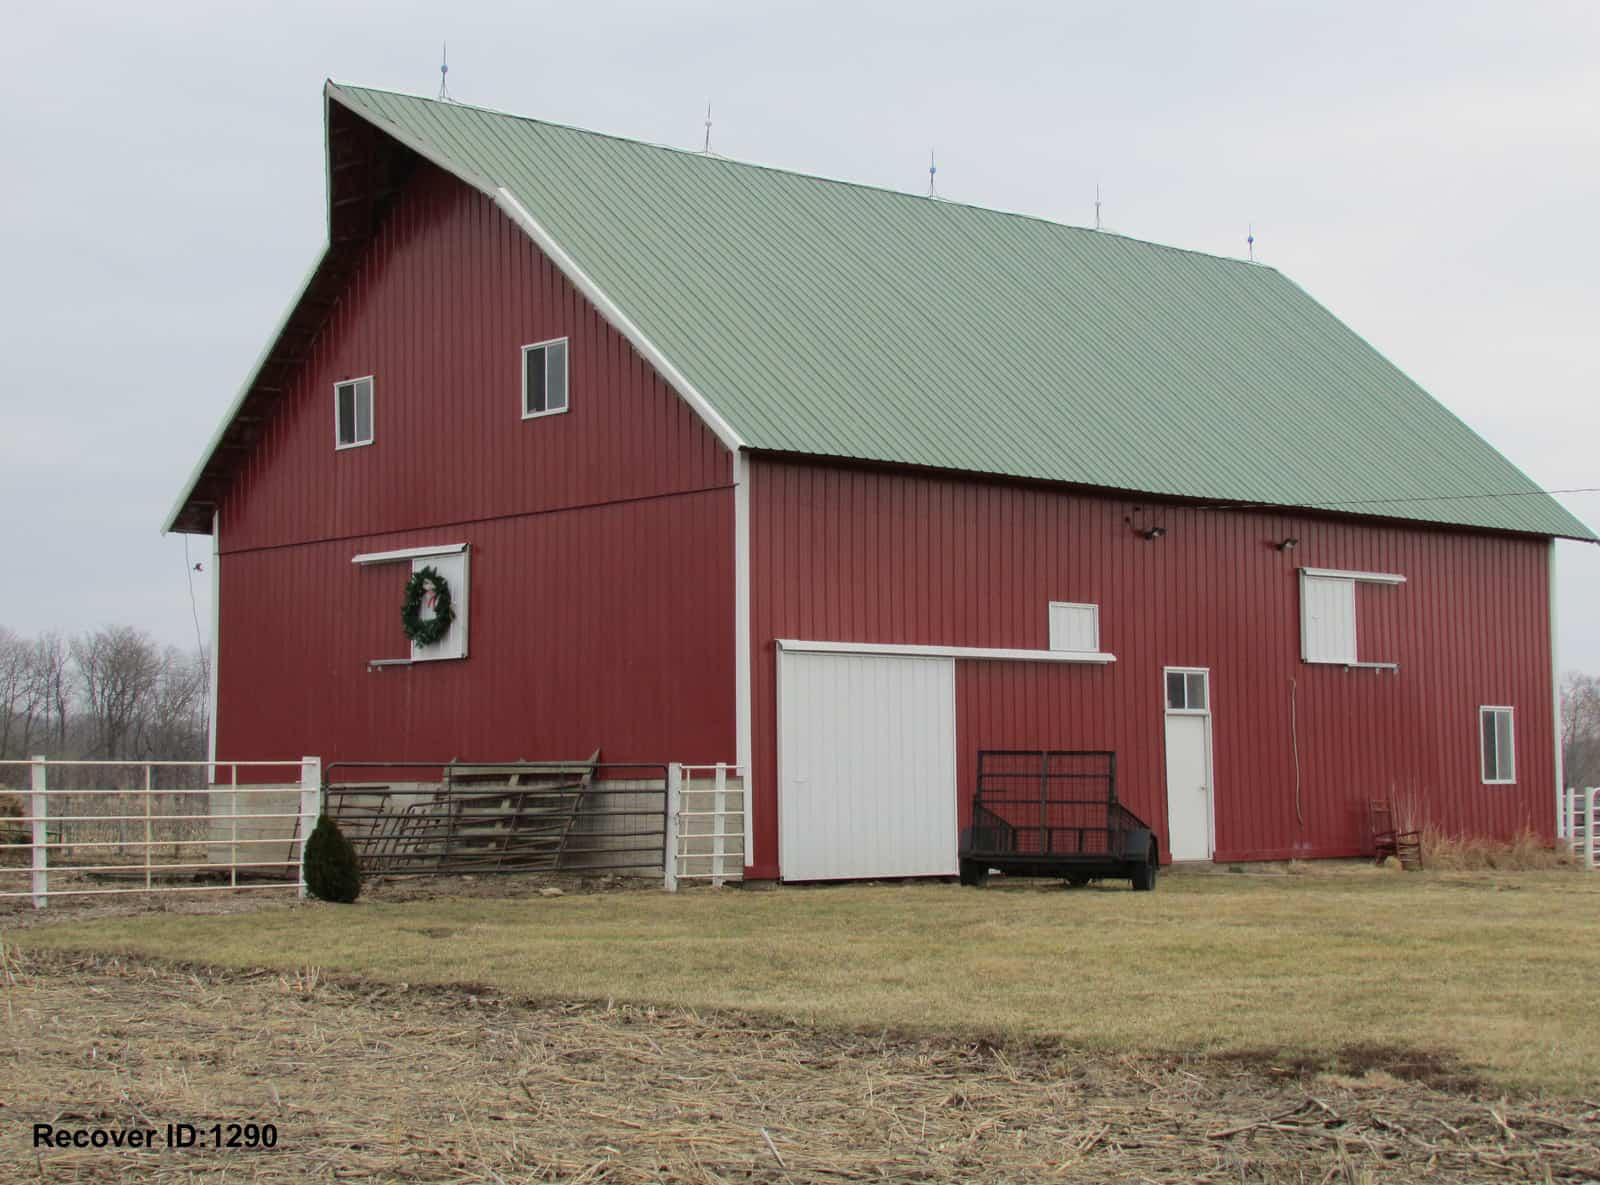 Barn Remodel Iowa, Barn Remodel Illinois